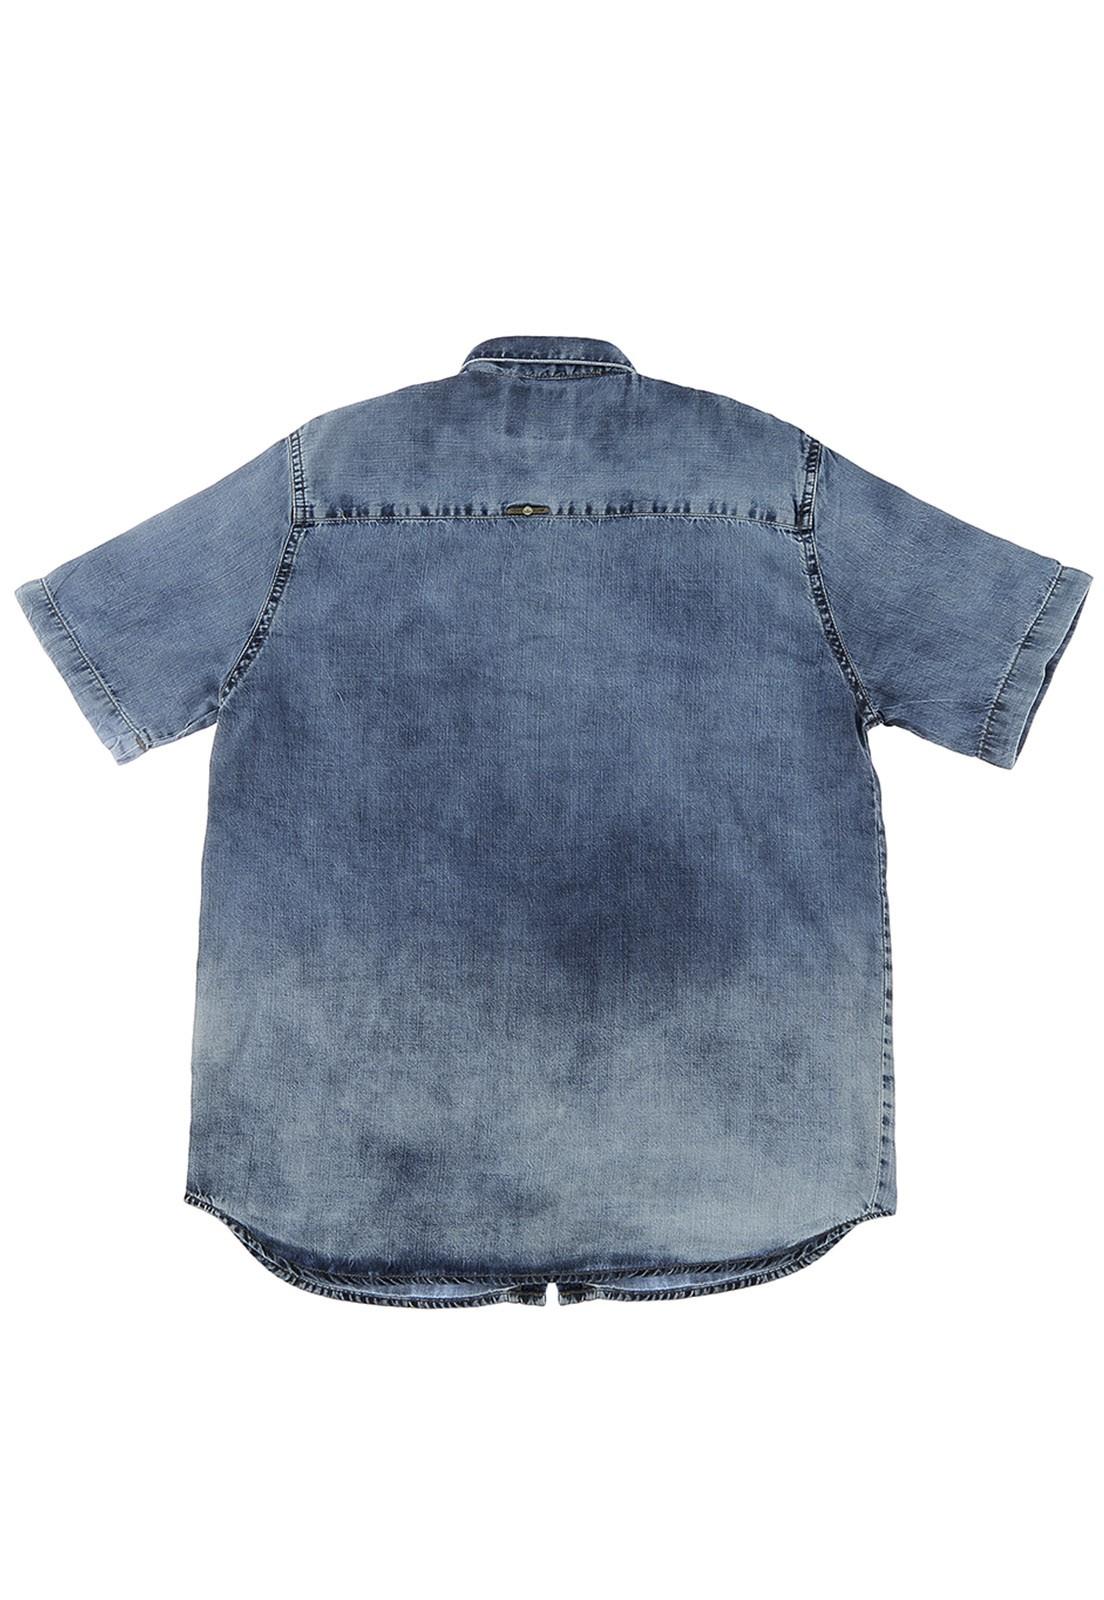 Camisa de Manga Curta Crawling Jeans Masculina